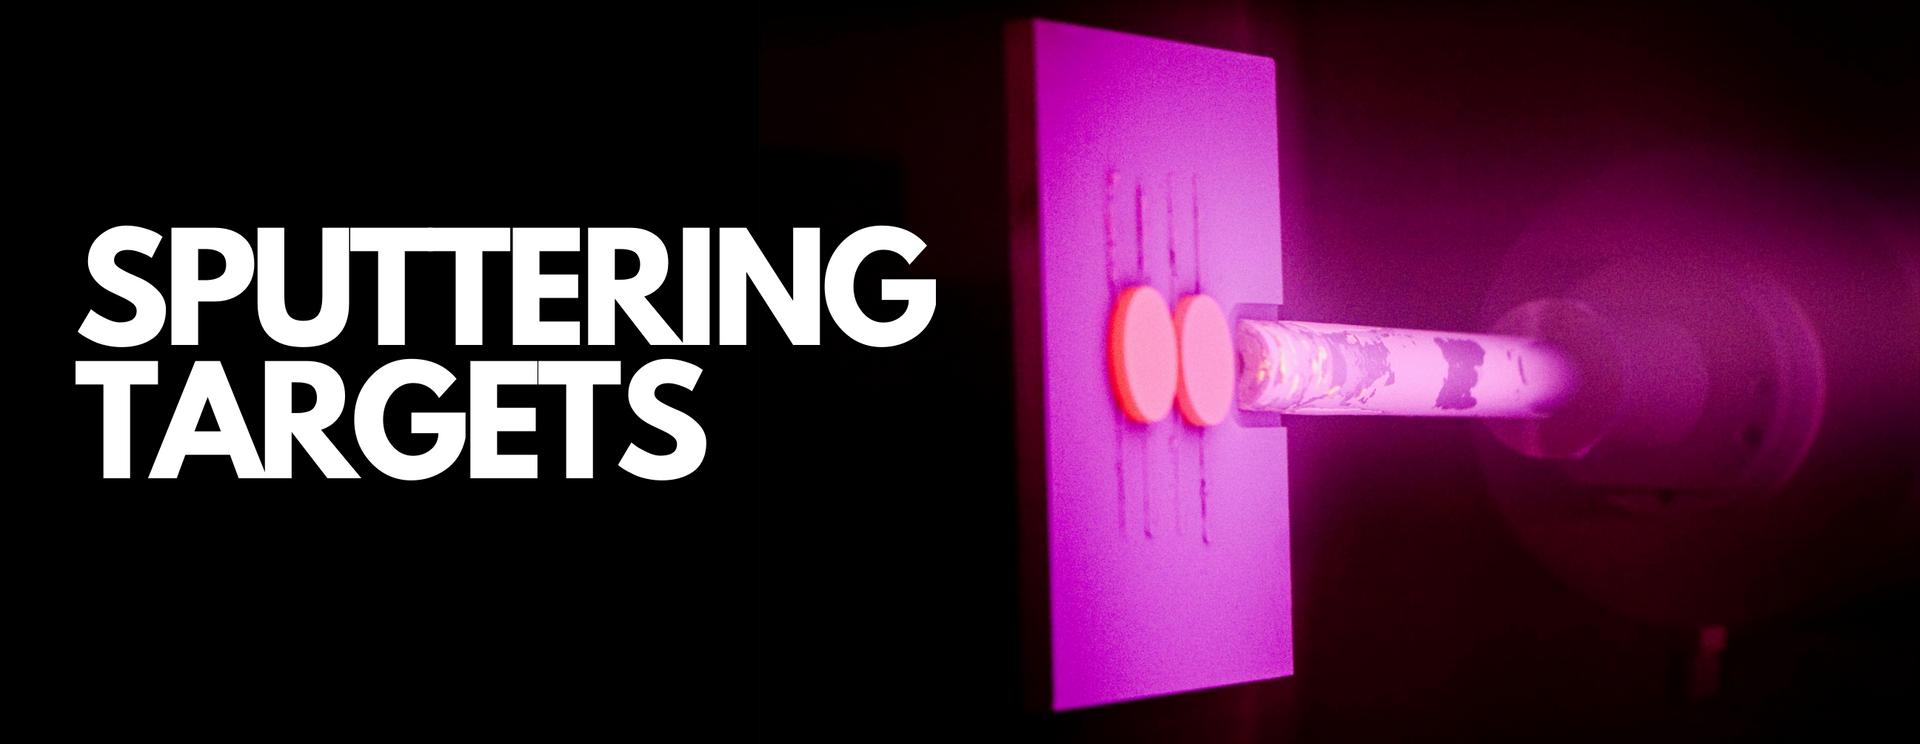 Nanografi Sputtering Targets Ürünleri